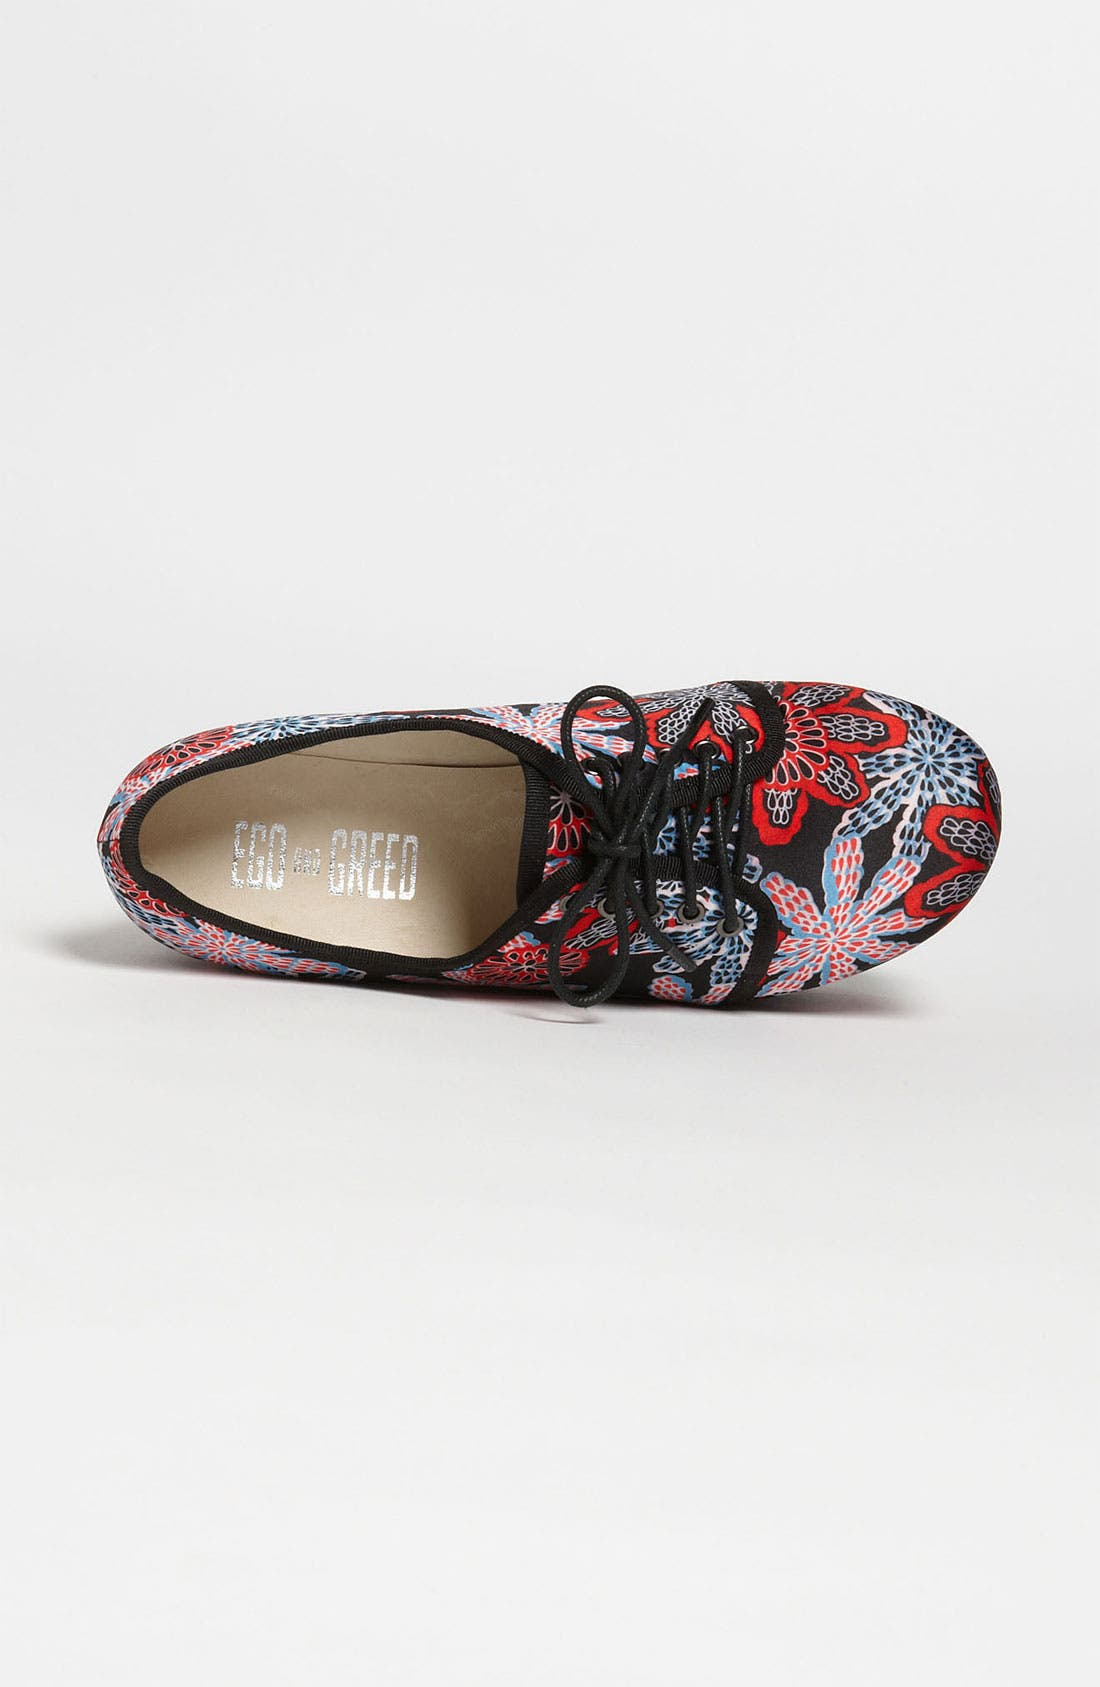 Alternate Image 3  - EGO and GREED 'Jungle Star' Platform Shoe